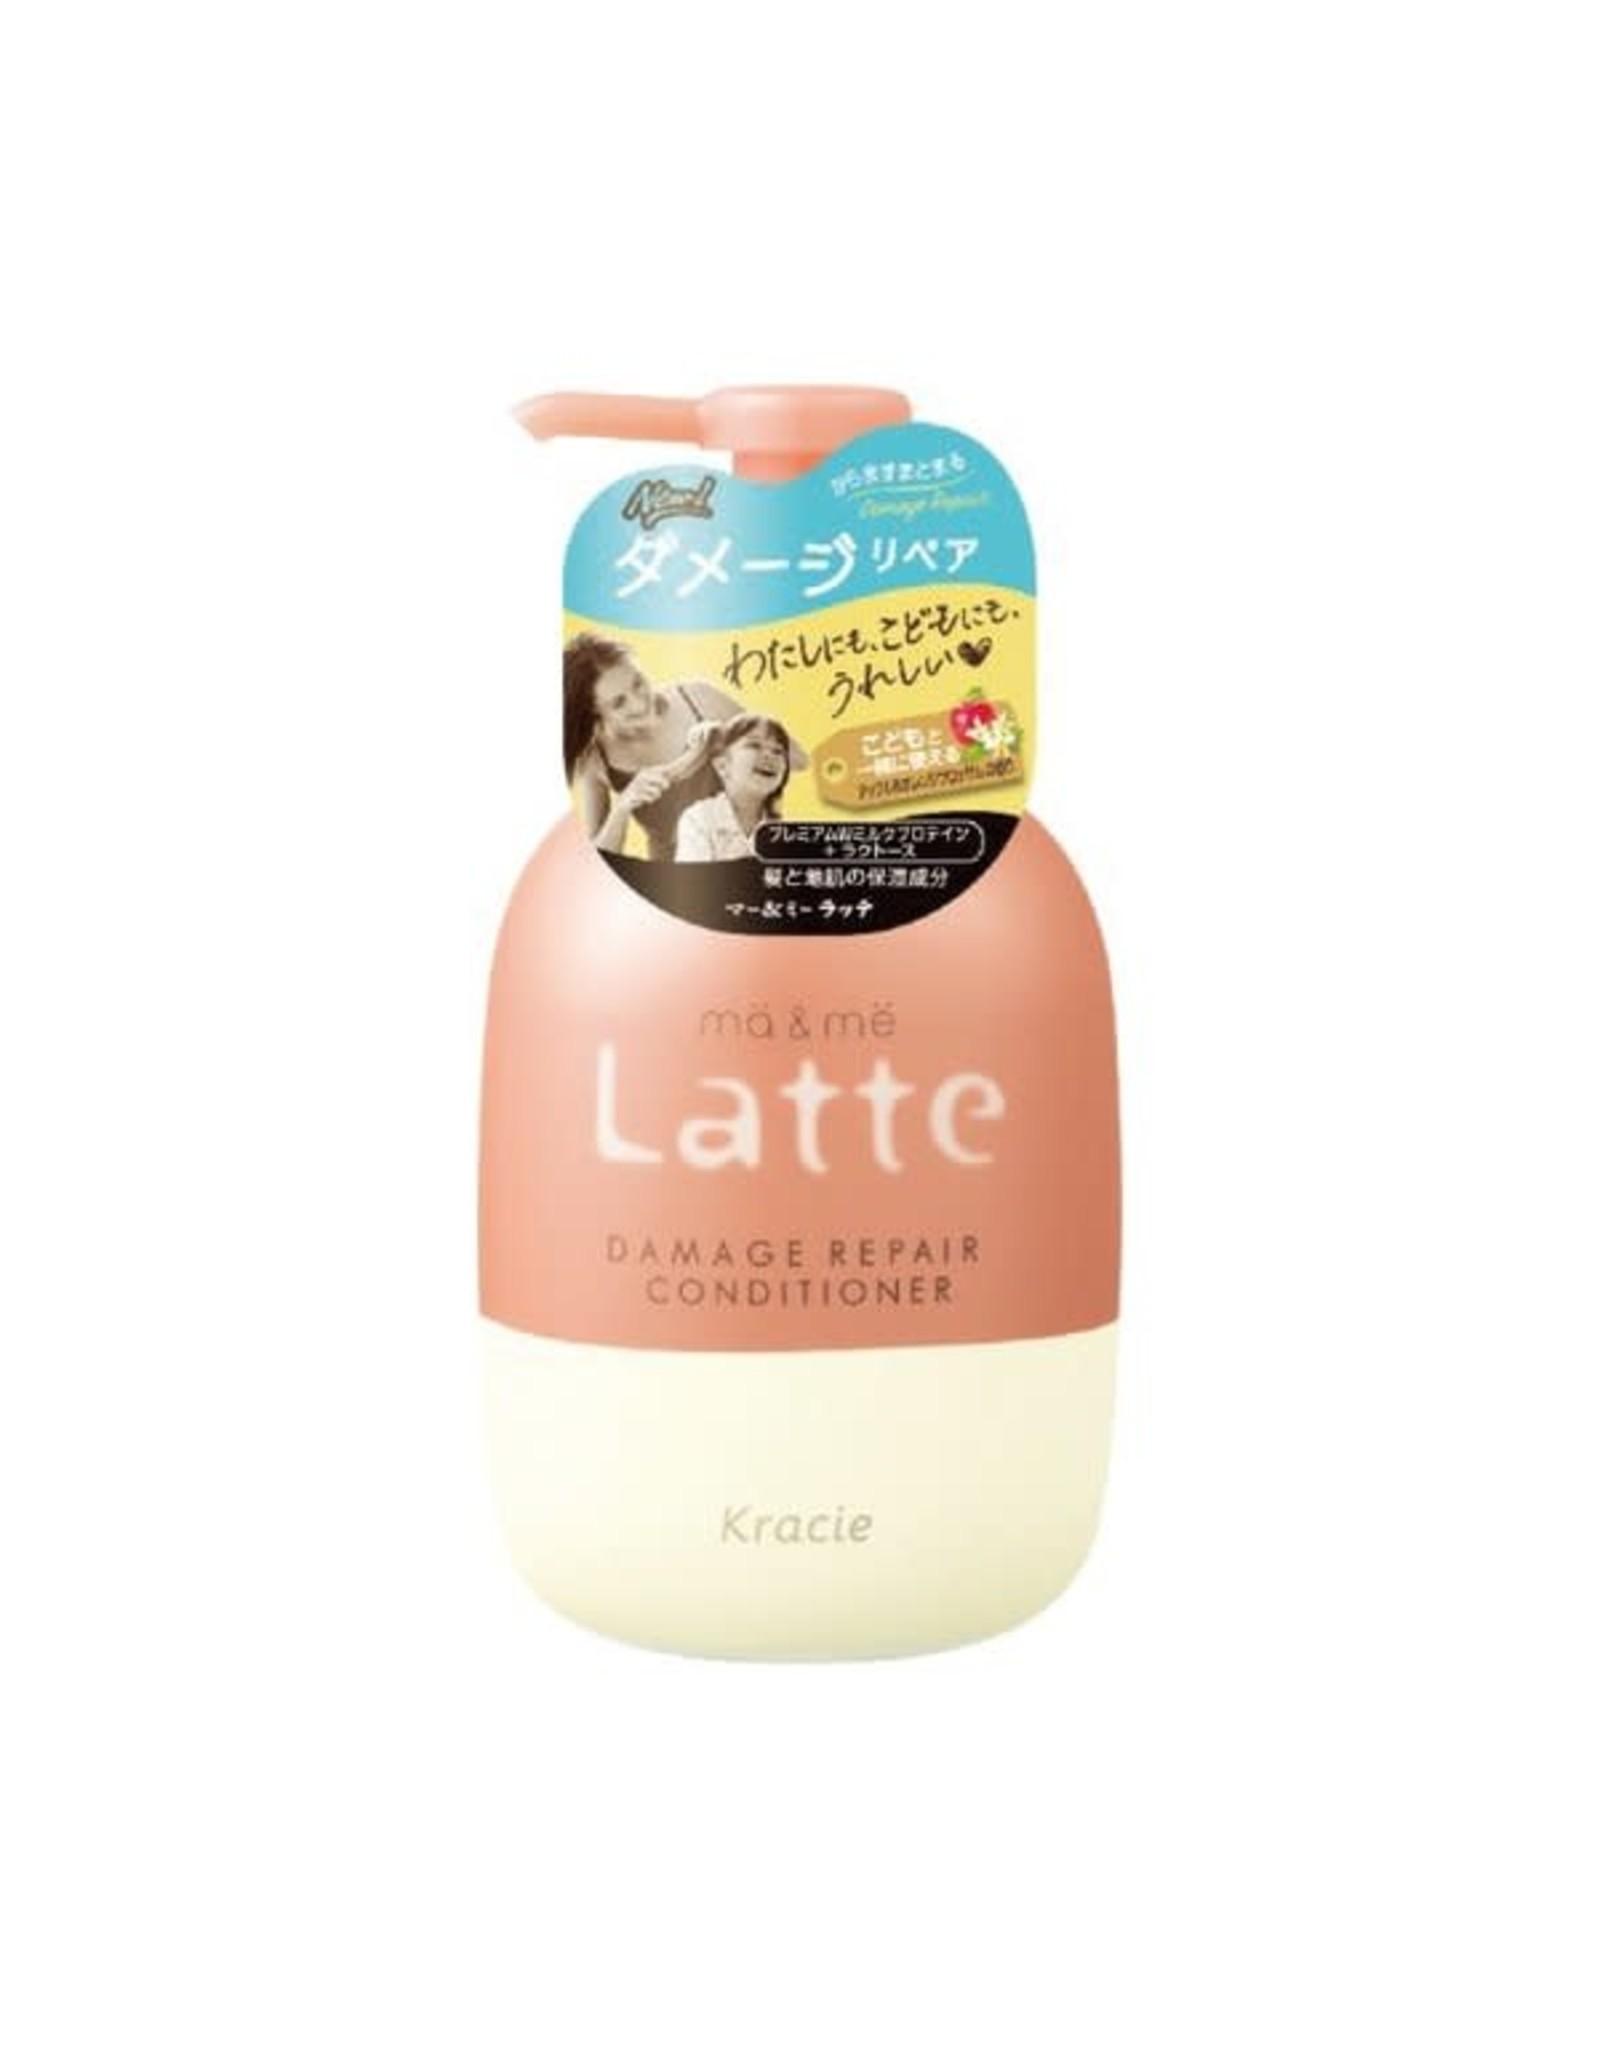 Kracie Kracie Ma&Me Latte Damage Repair Conditioner